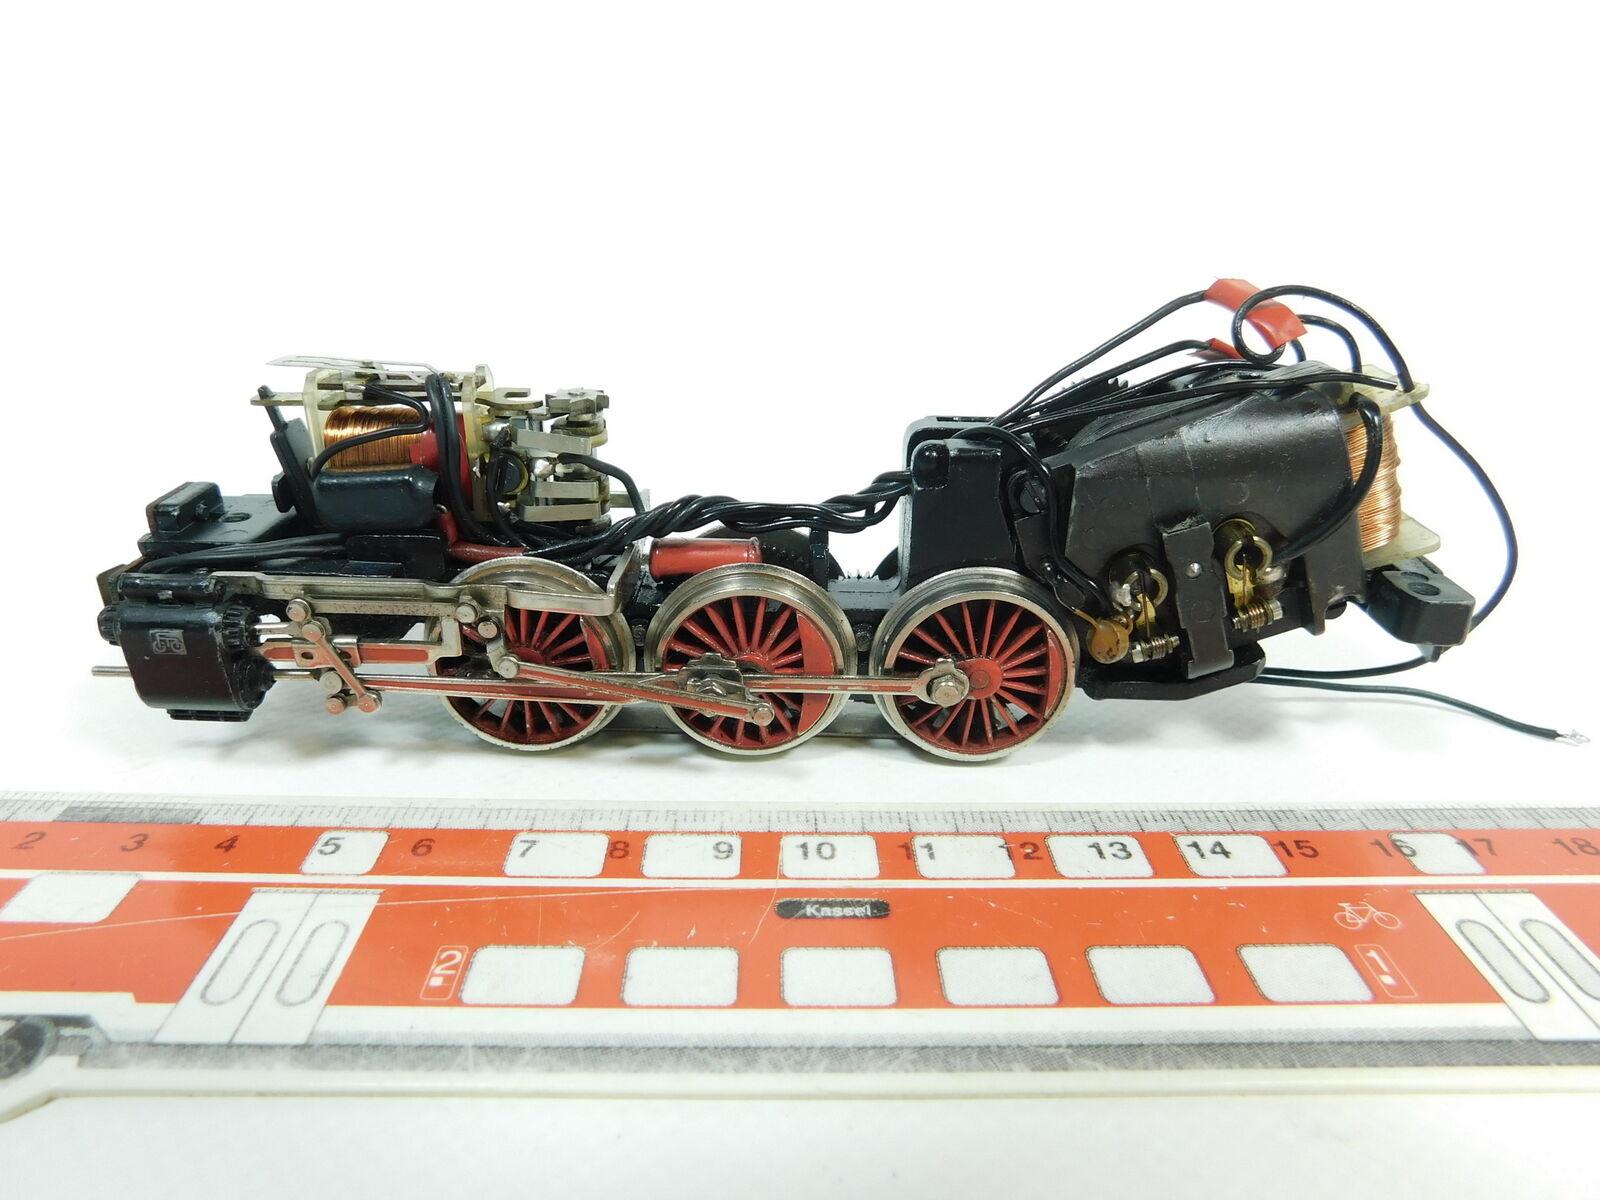 Bc804-1Märklin h0 ac chassis for 3026 f 800 Steam Locomotive 01 097 DB